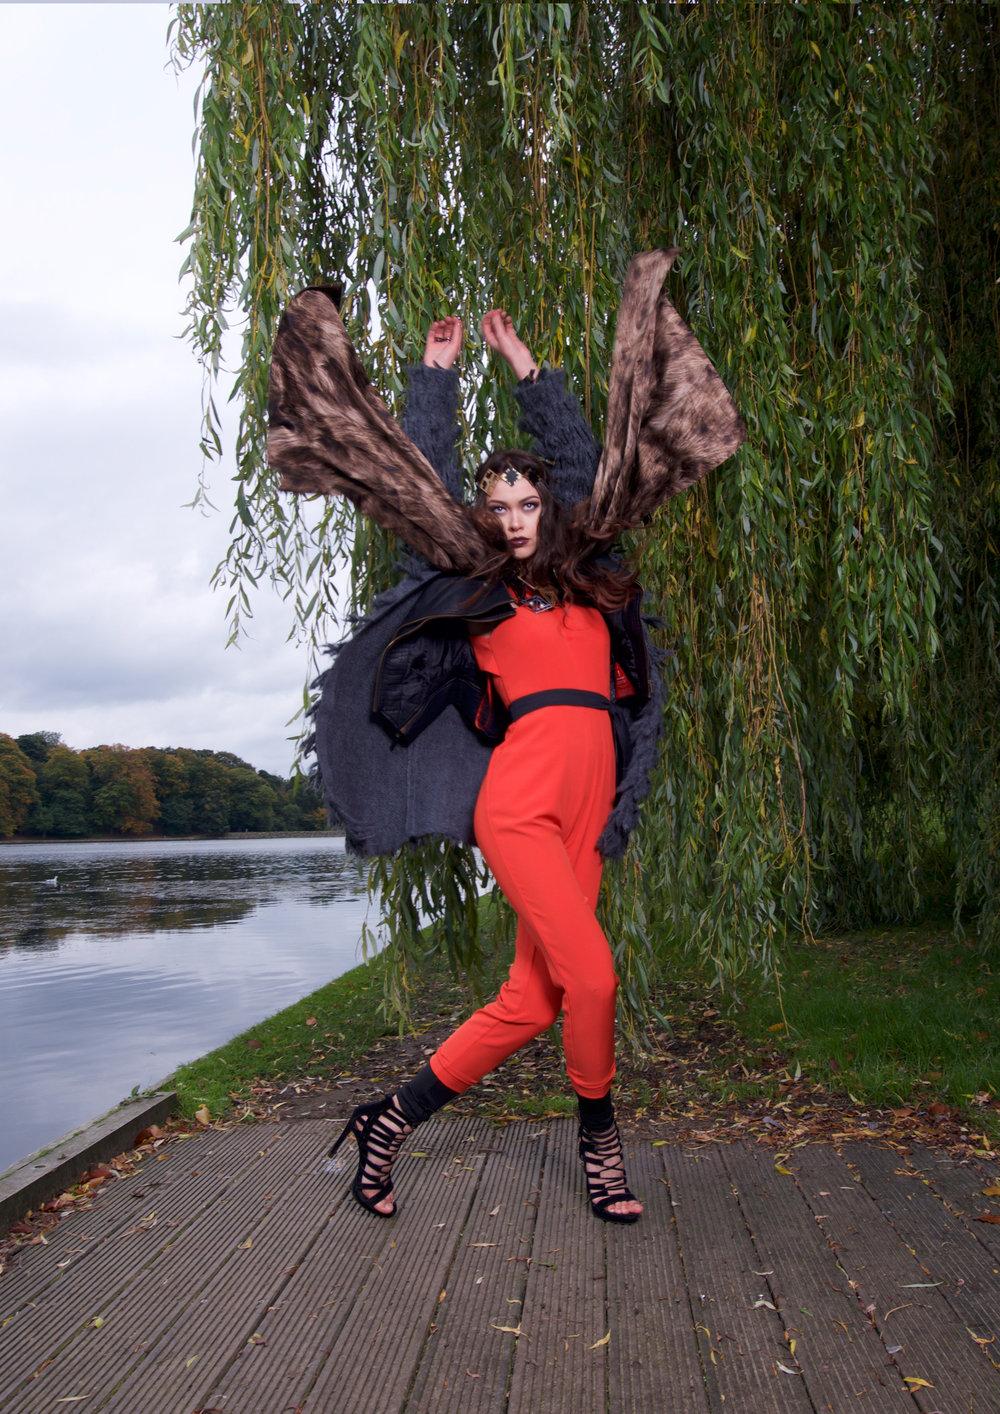 zaramia-ava-zaramiaava-leeds-fashion-designer-ethical-sustainable-tailored-minimalist-jacket-accent-coat-jacket-print-shirt-top-versatile-drape-cowl-styling-shop-womenswear-models-photoshoot-colour-14